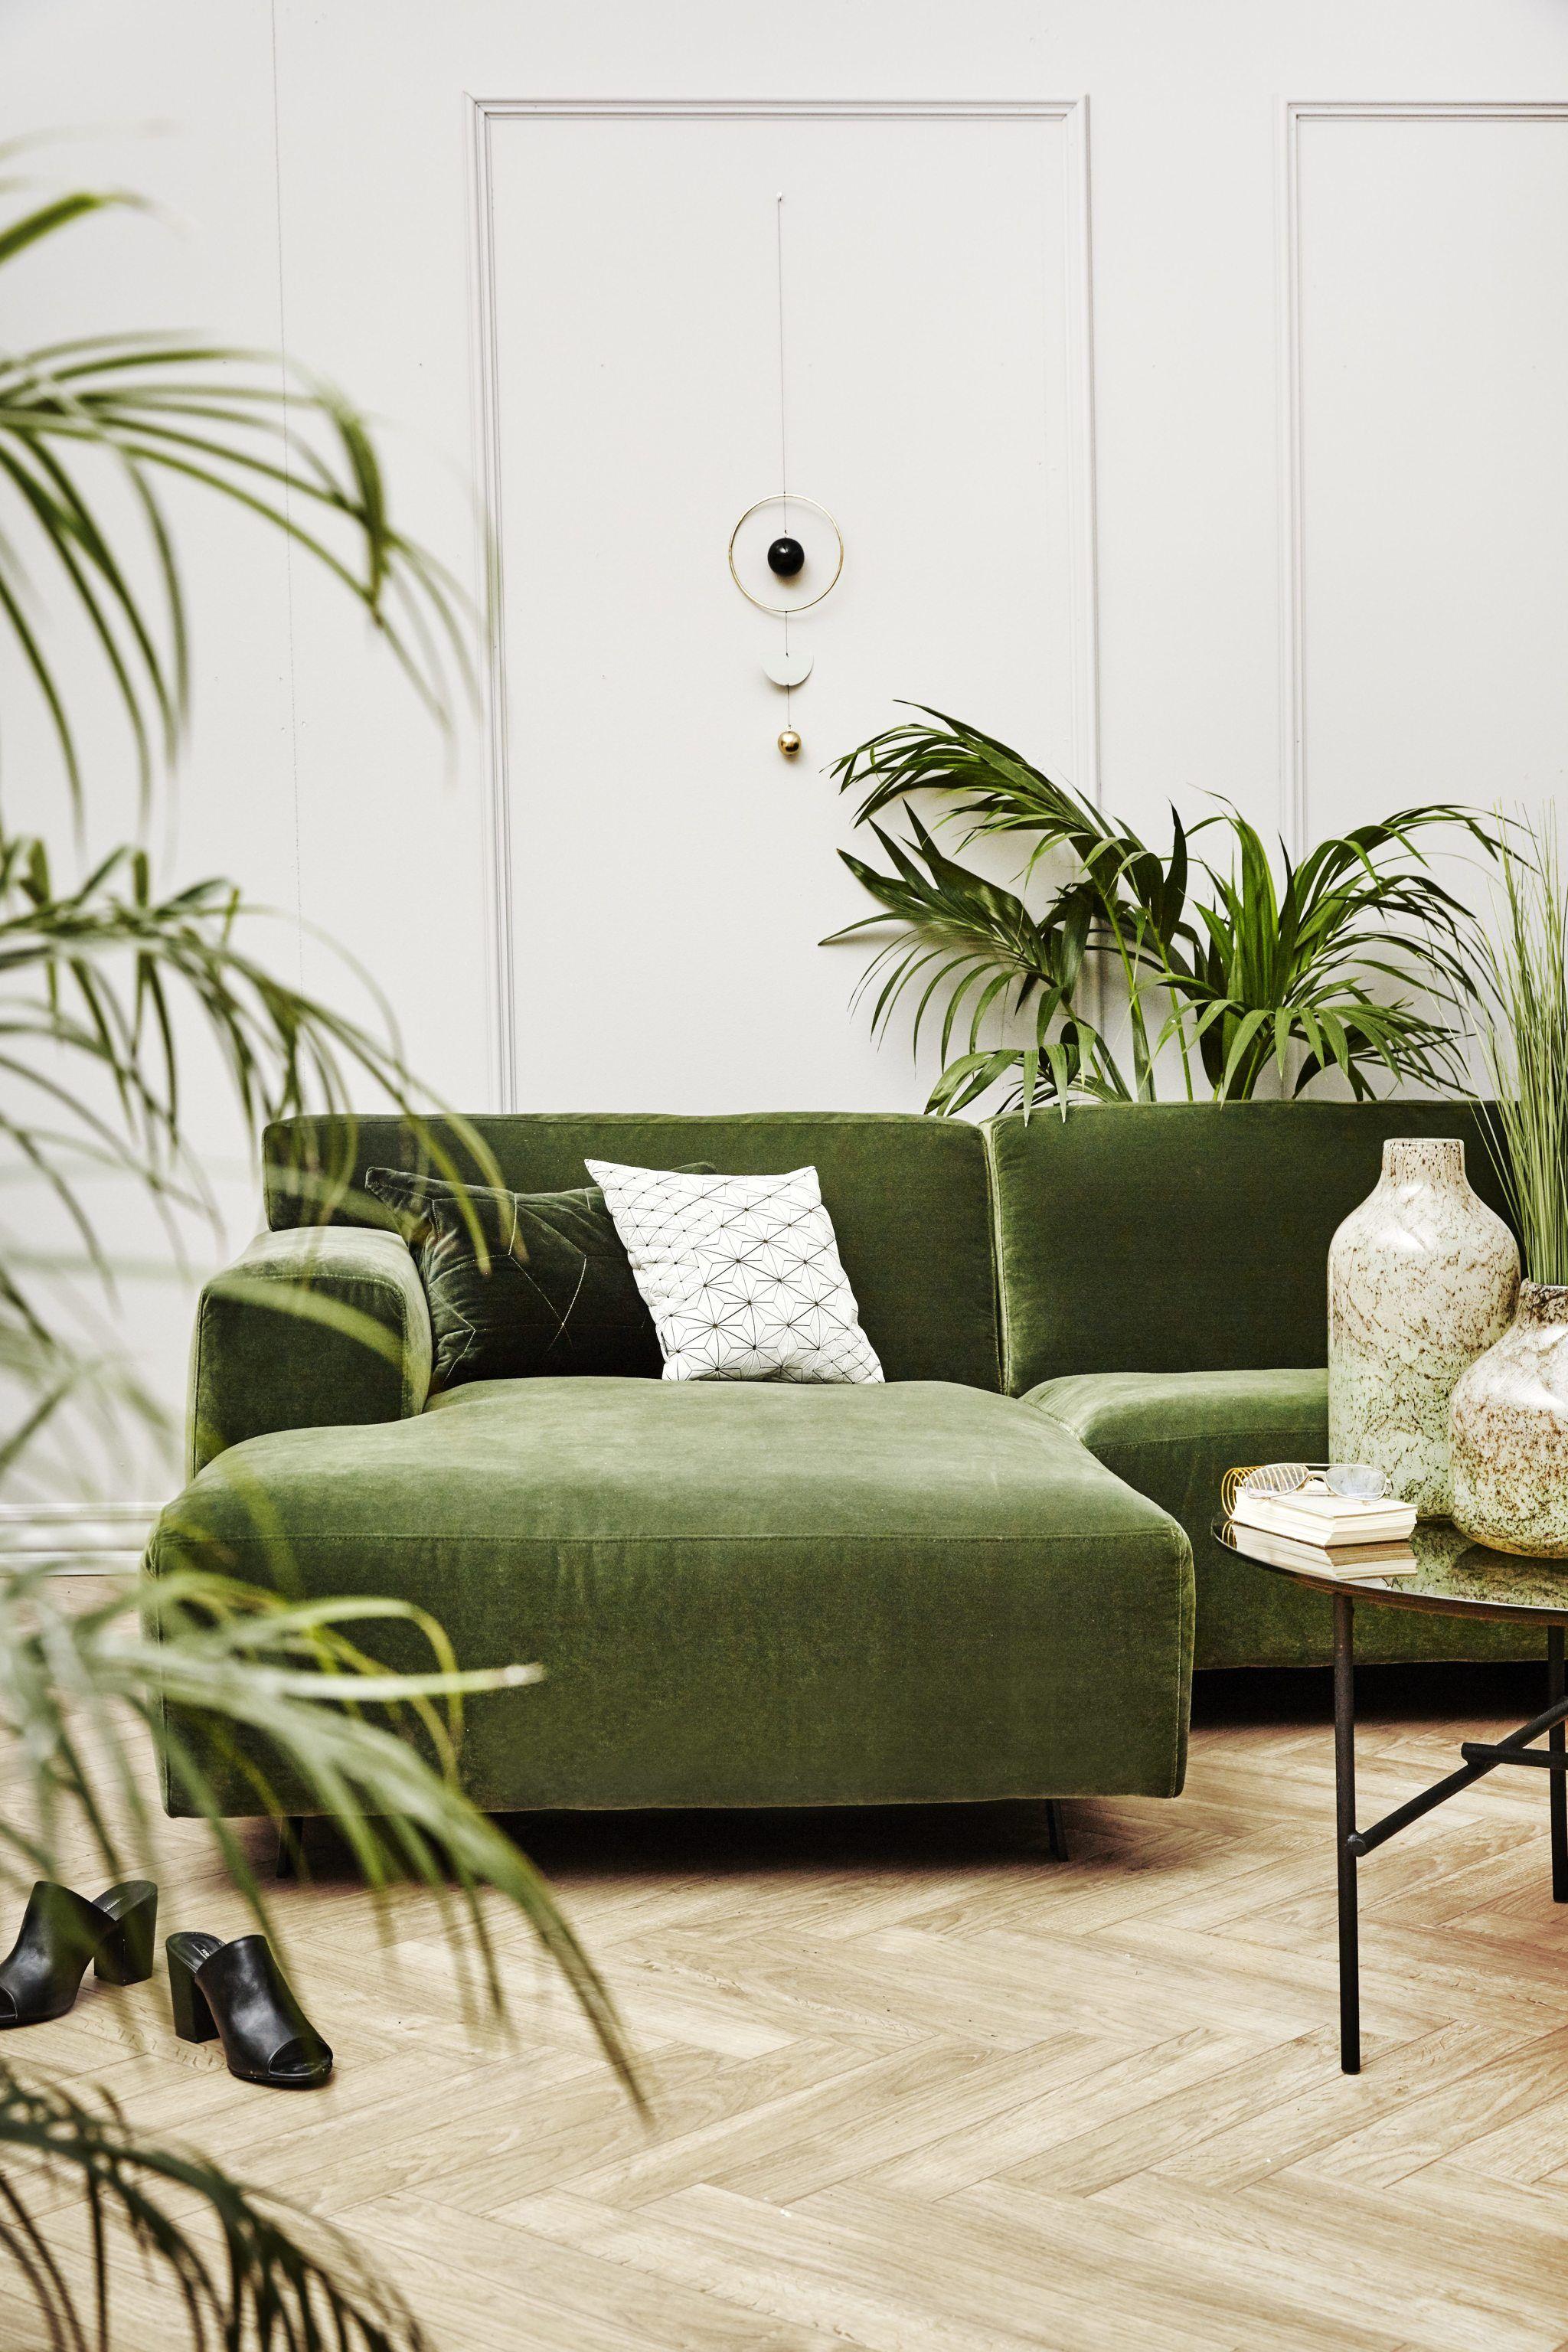 ilva sofa Billedresultat for ilva grøn velour sofa | uu in 2018 | Pinterest  ilva sofa